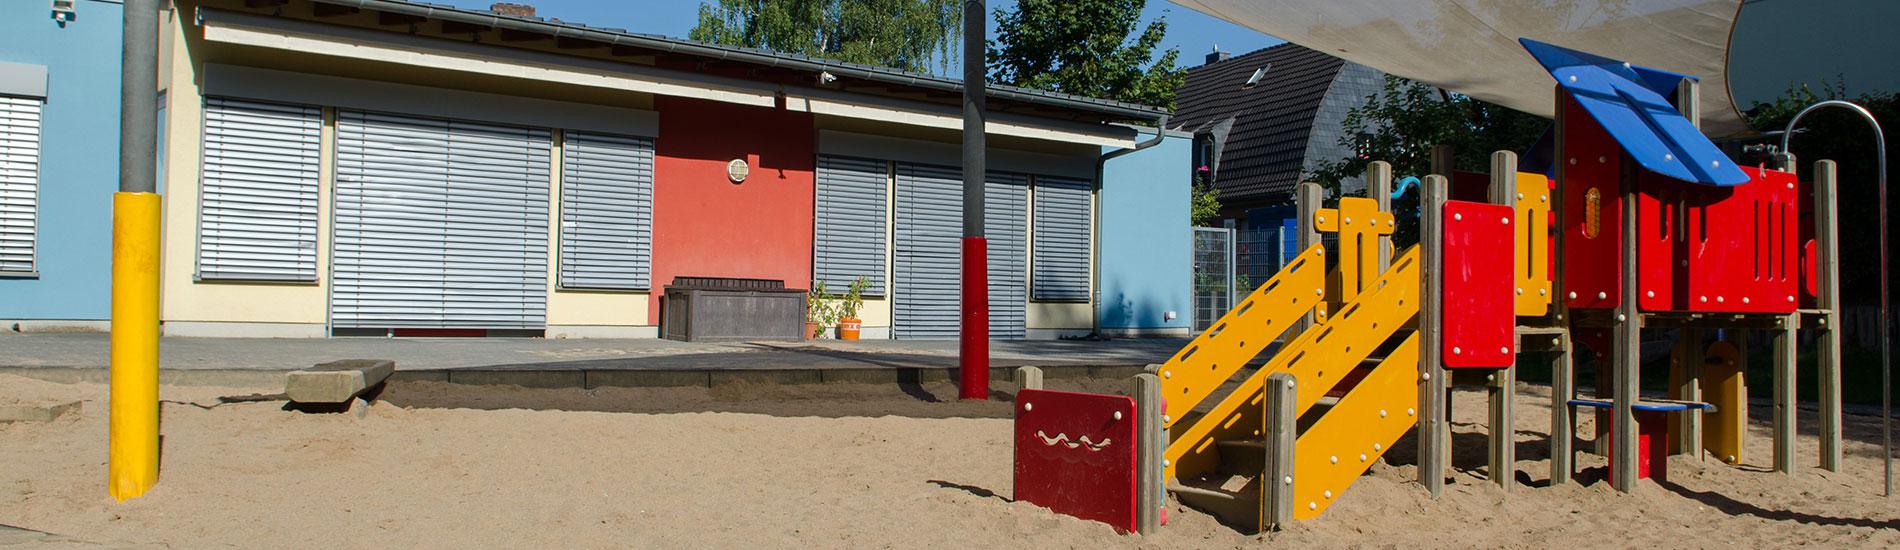 Carrusel Spielplatz